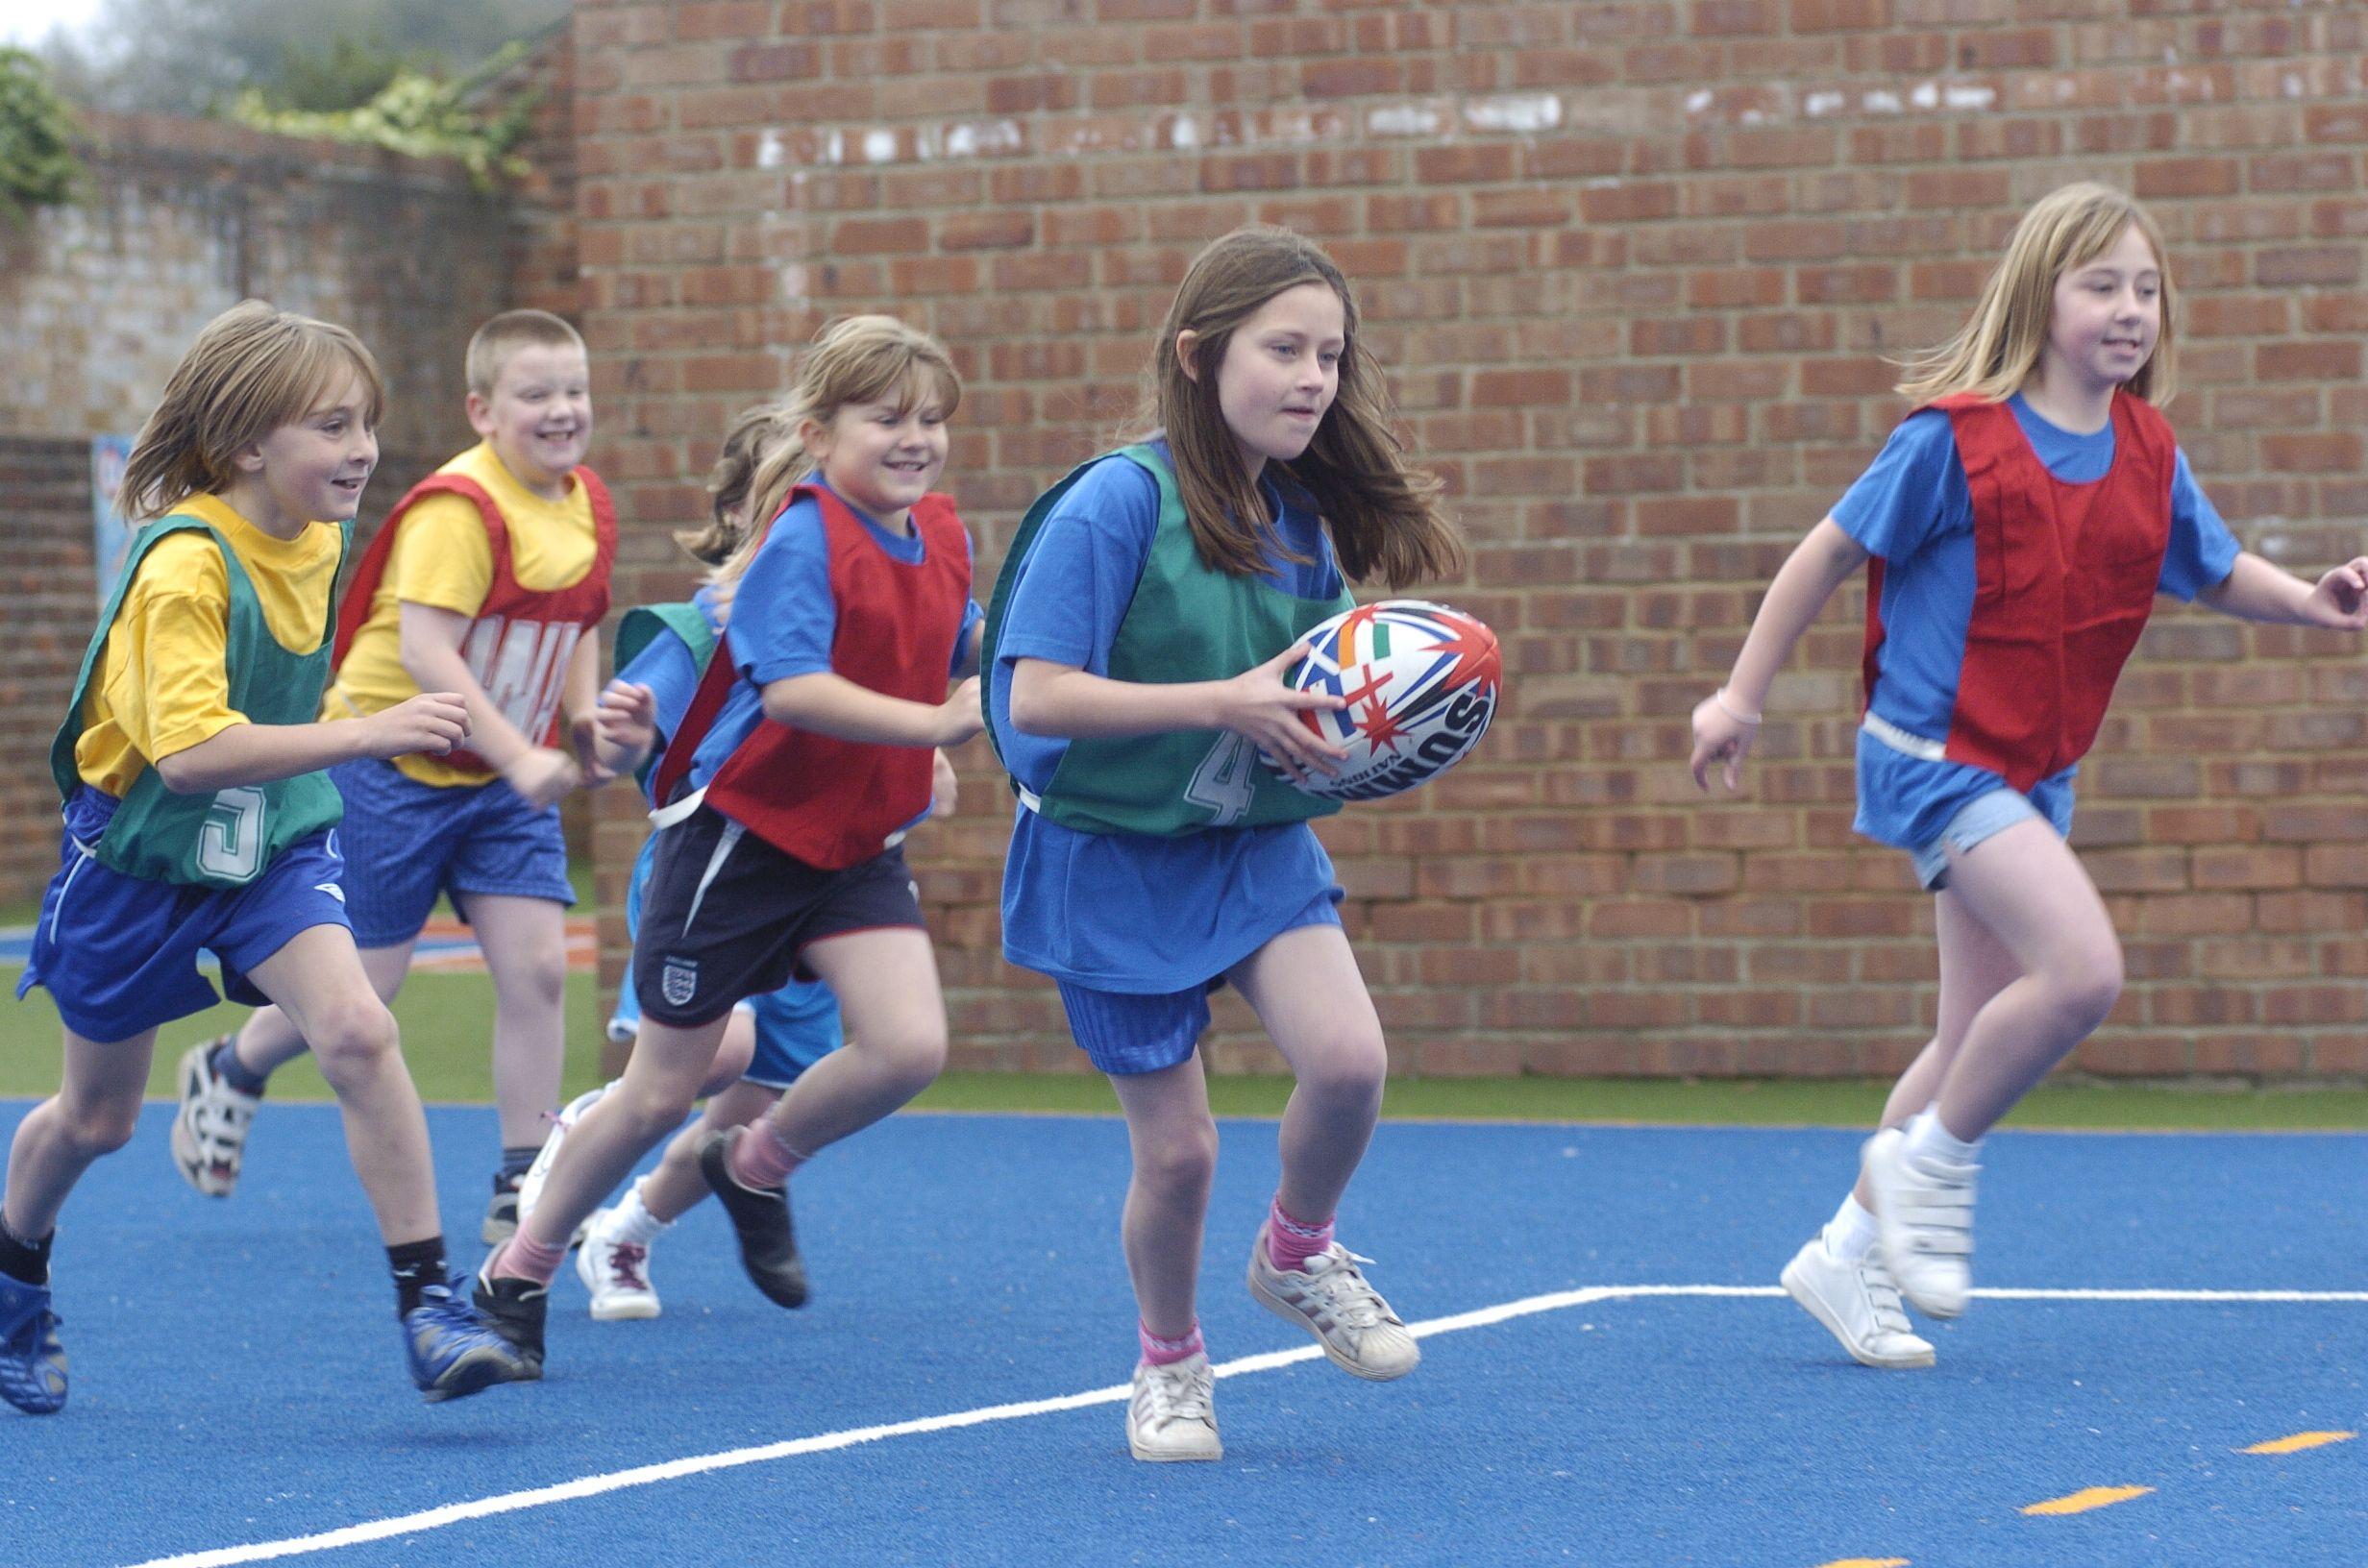 Enjoyment is no1 reason for sport participation – survey